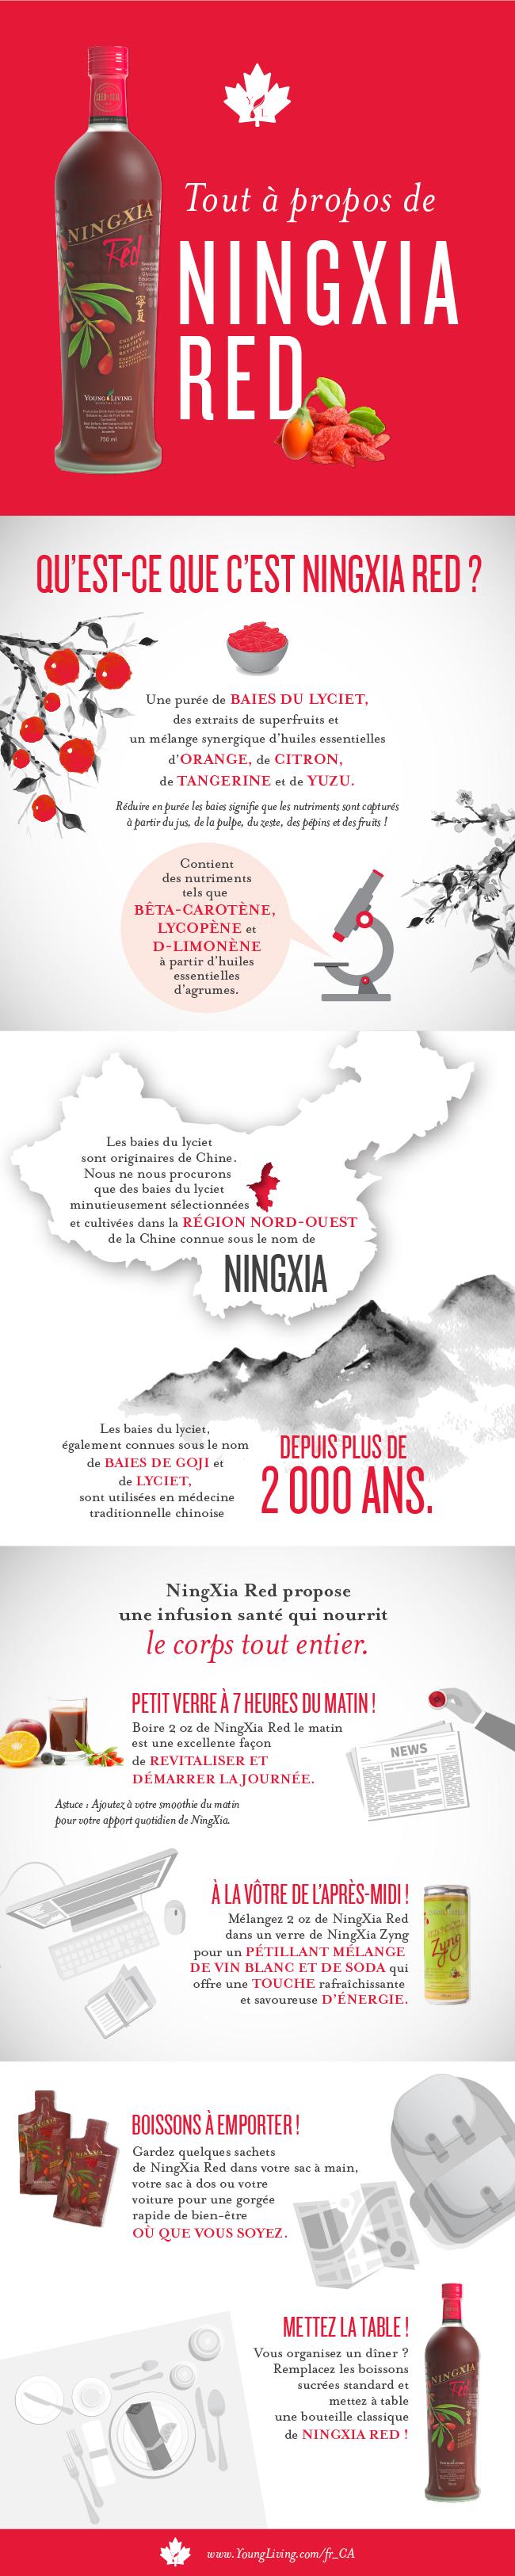 Ningxia red.jpg